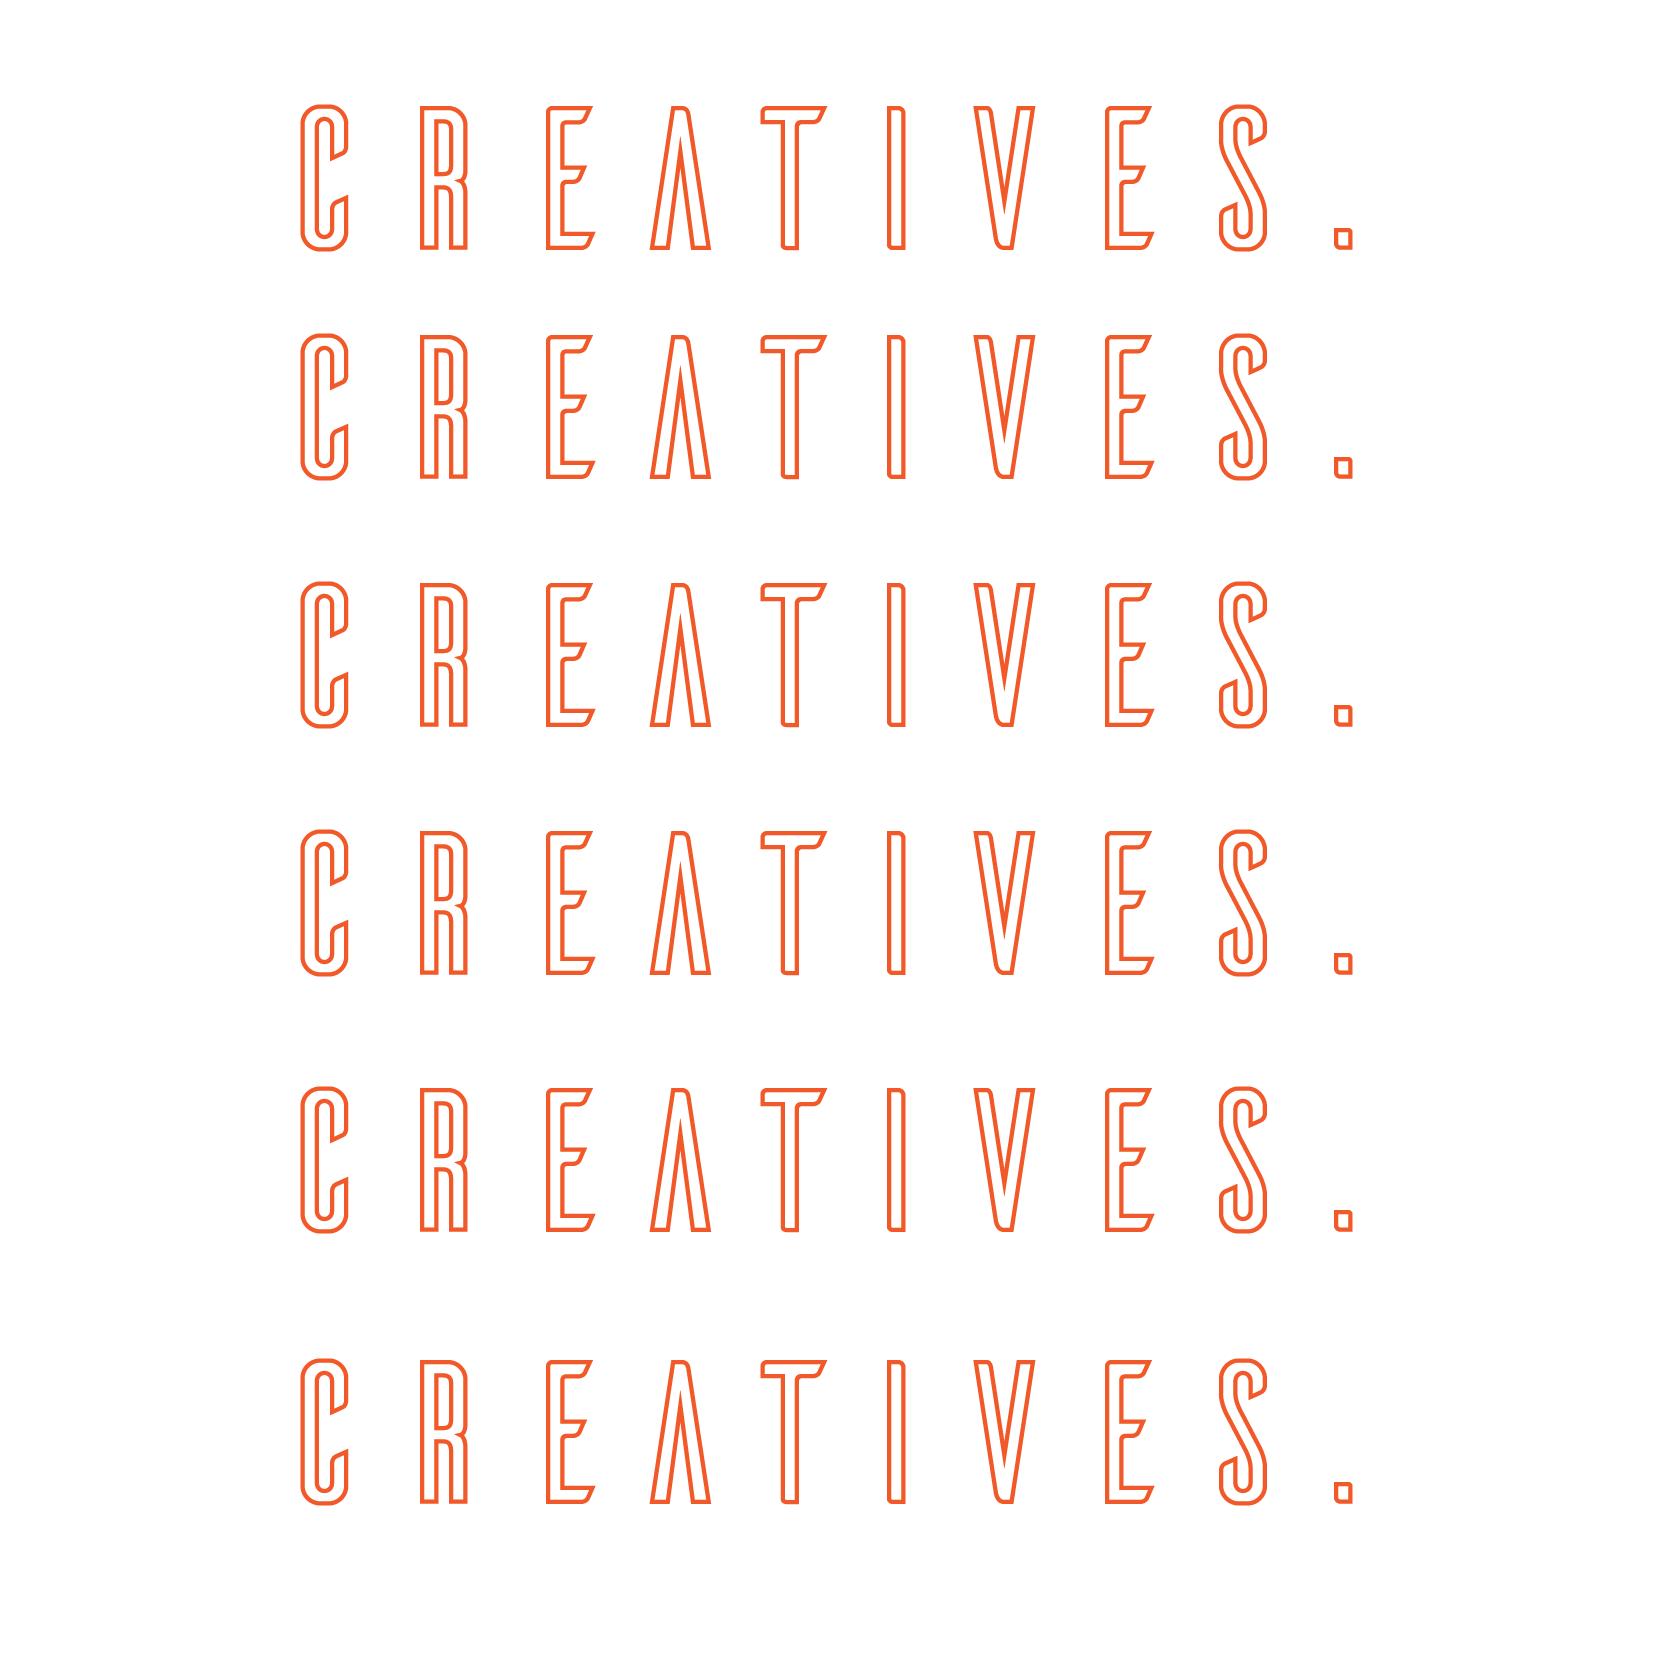 creatives-01.png